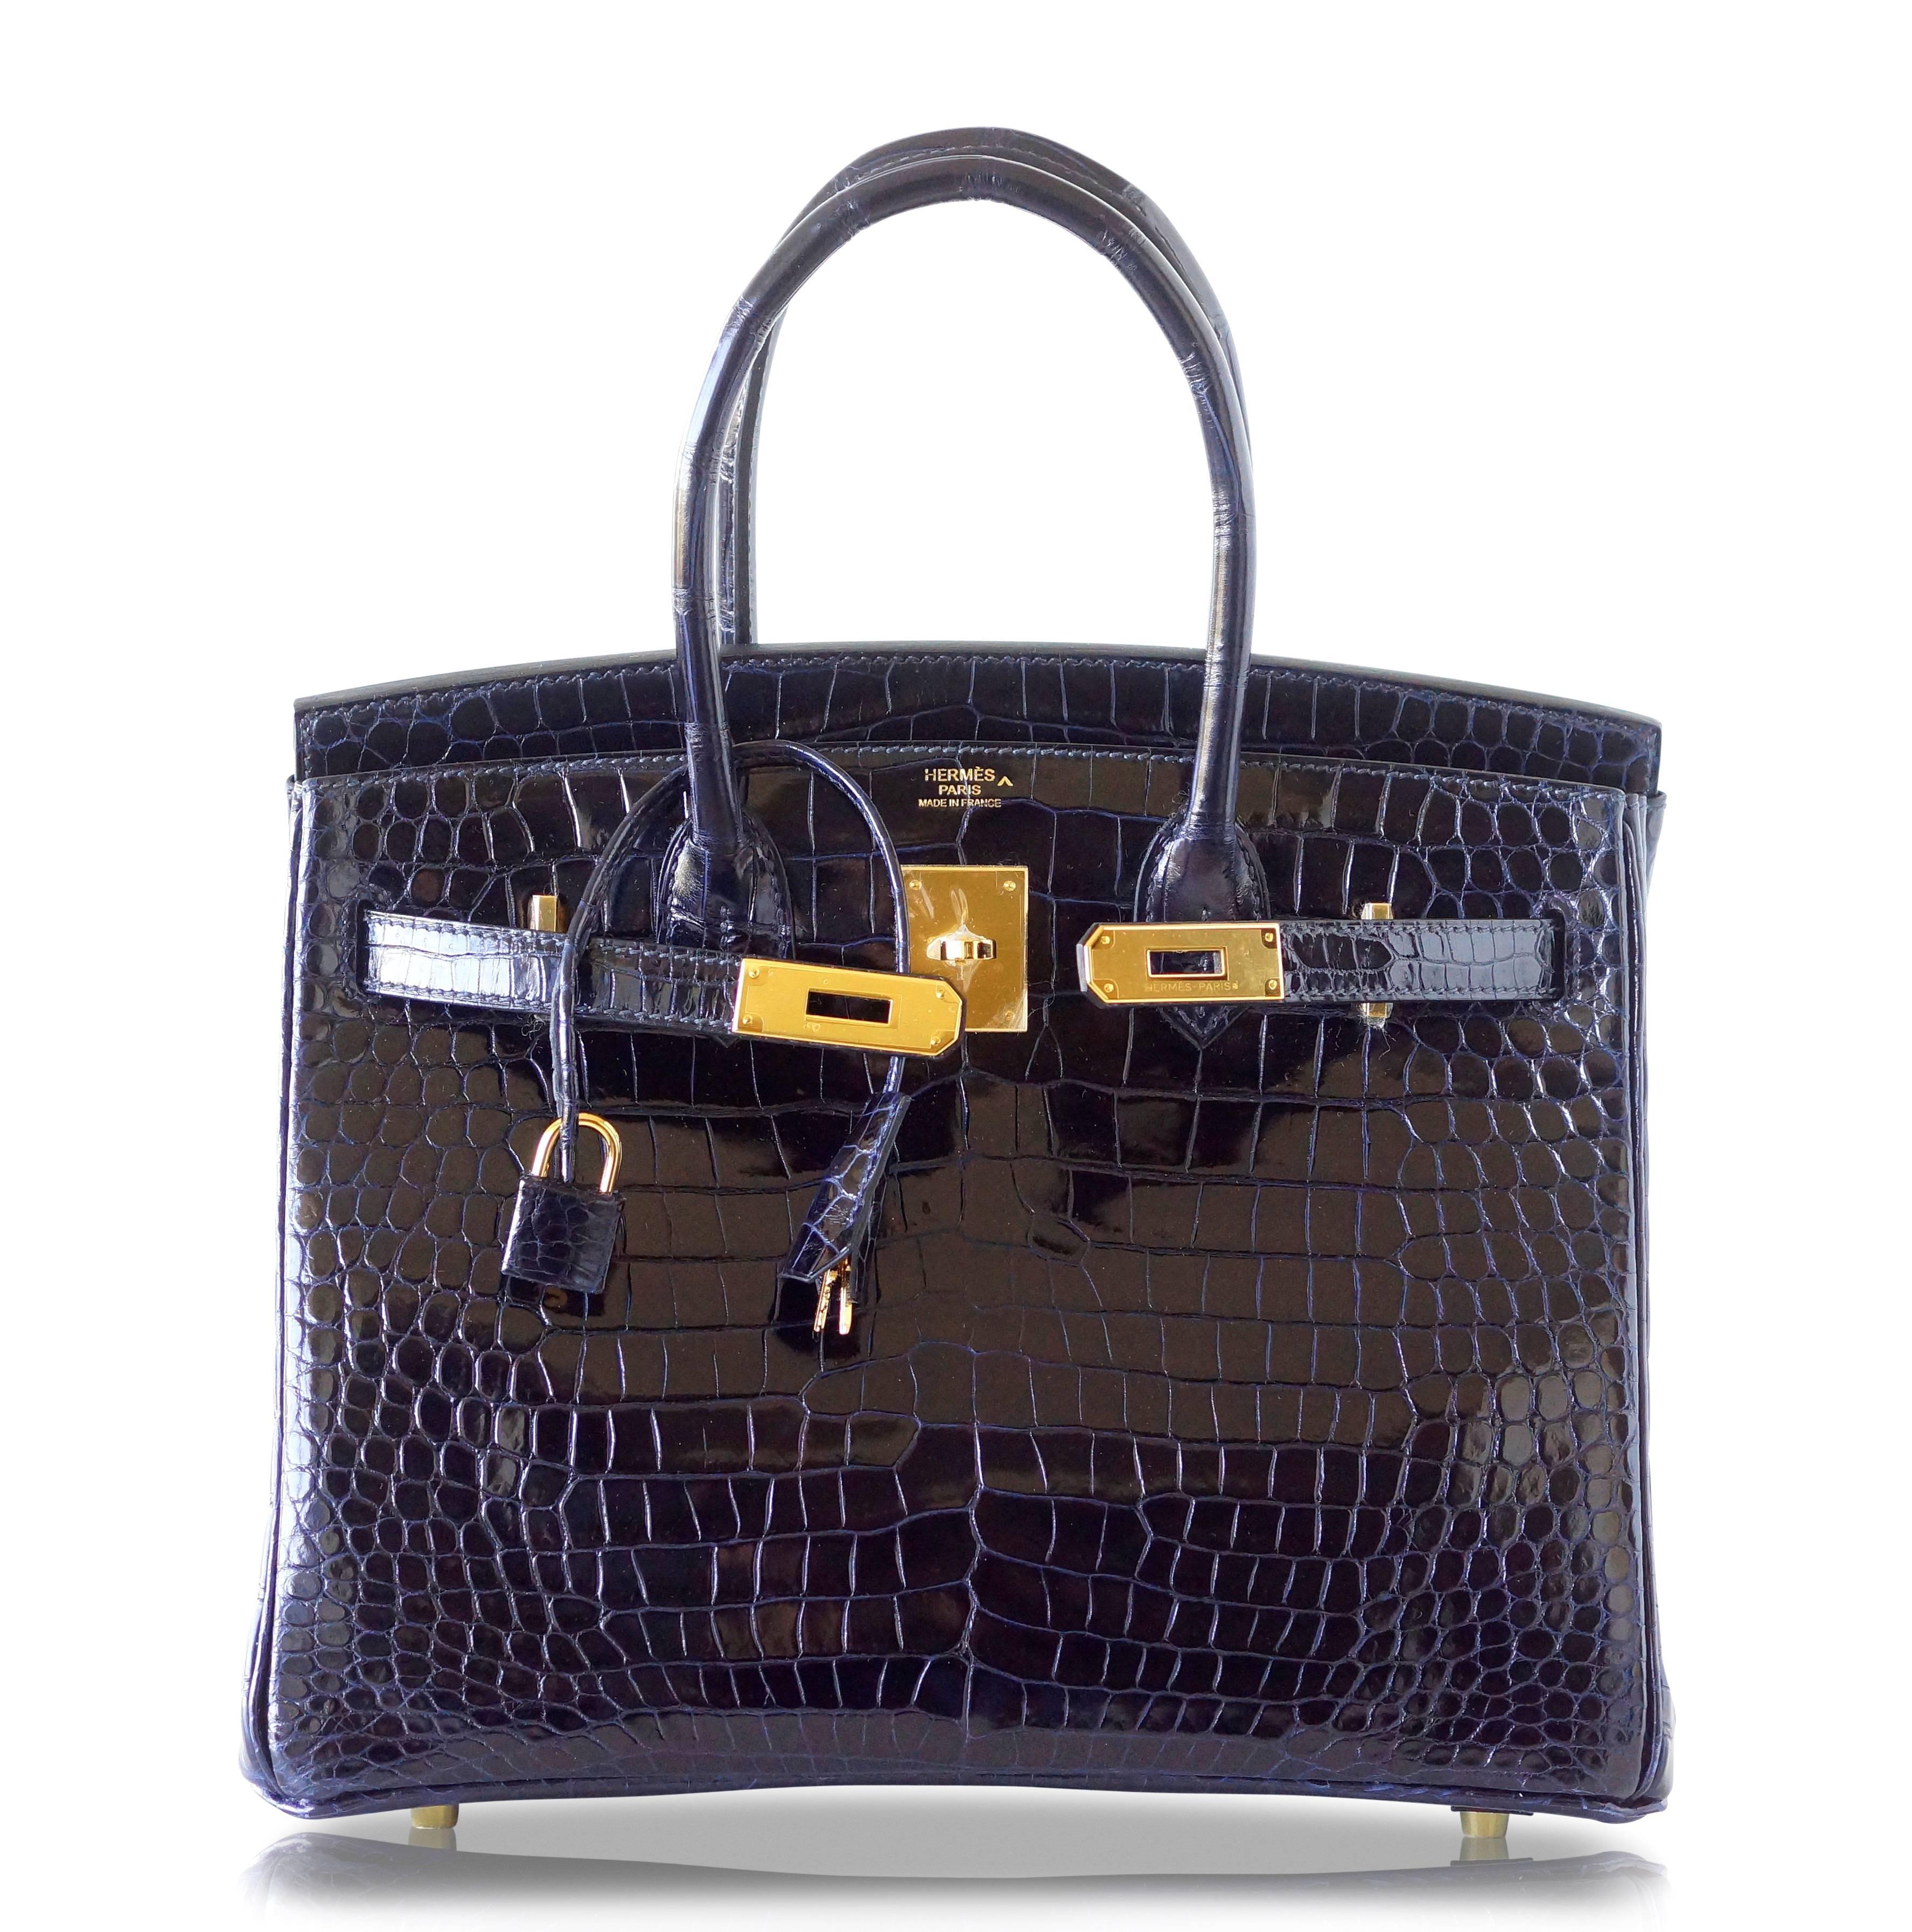 50e246e560d ... where can i buy hermes birkin 30 bag blue marine porosus crocodile gold  hardware in new